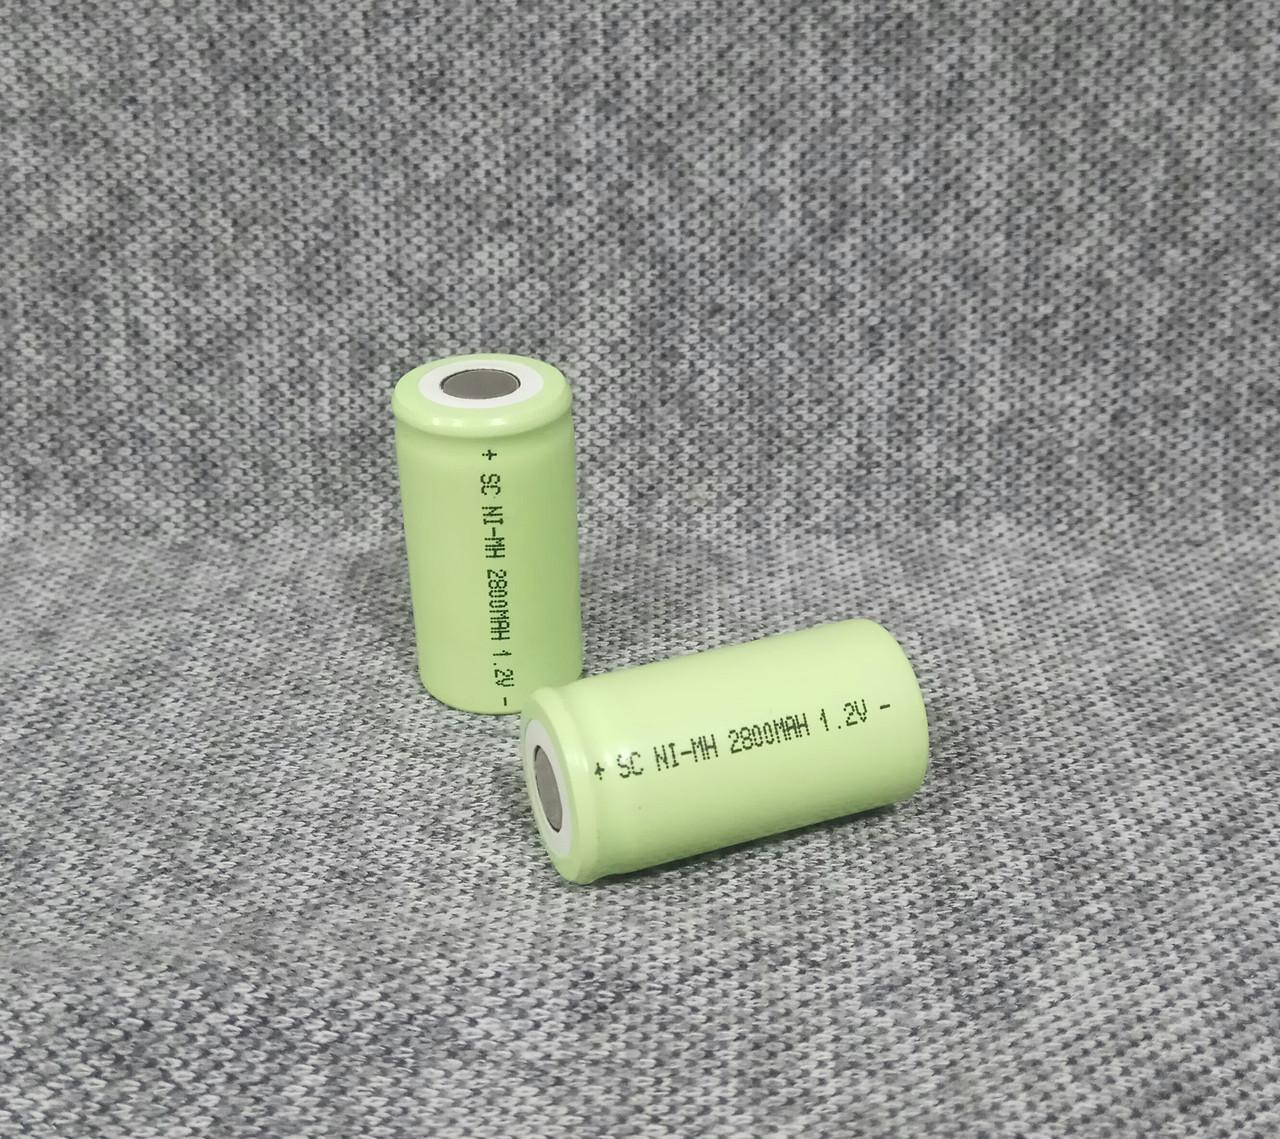 Аккумулятор для шуруповерта Ni Mh 200 SCK 2800mah